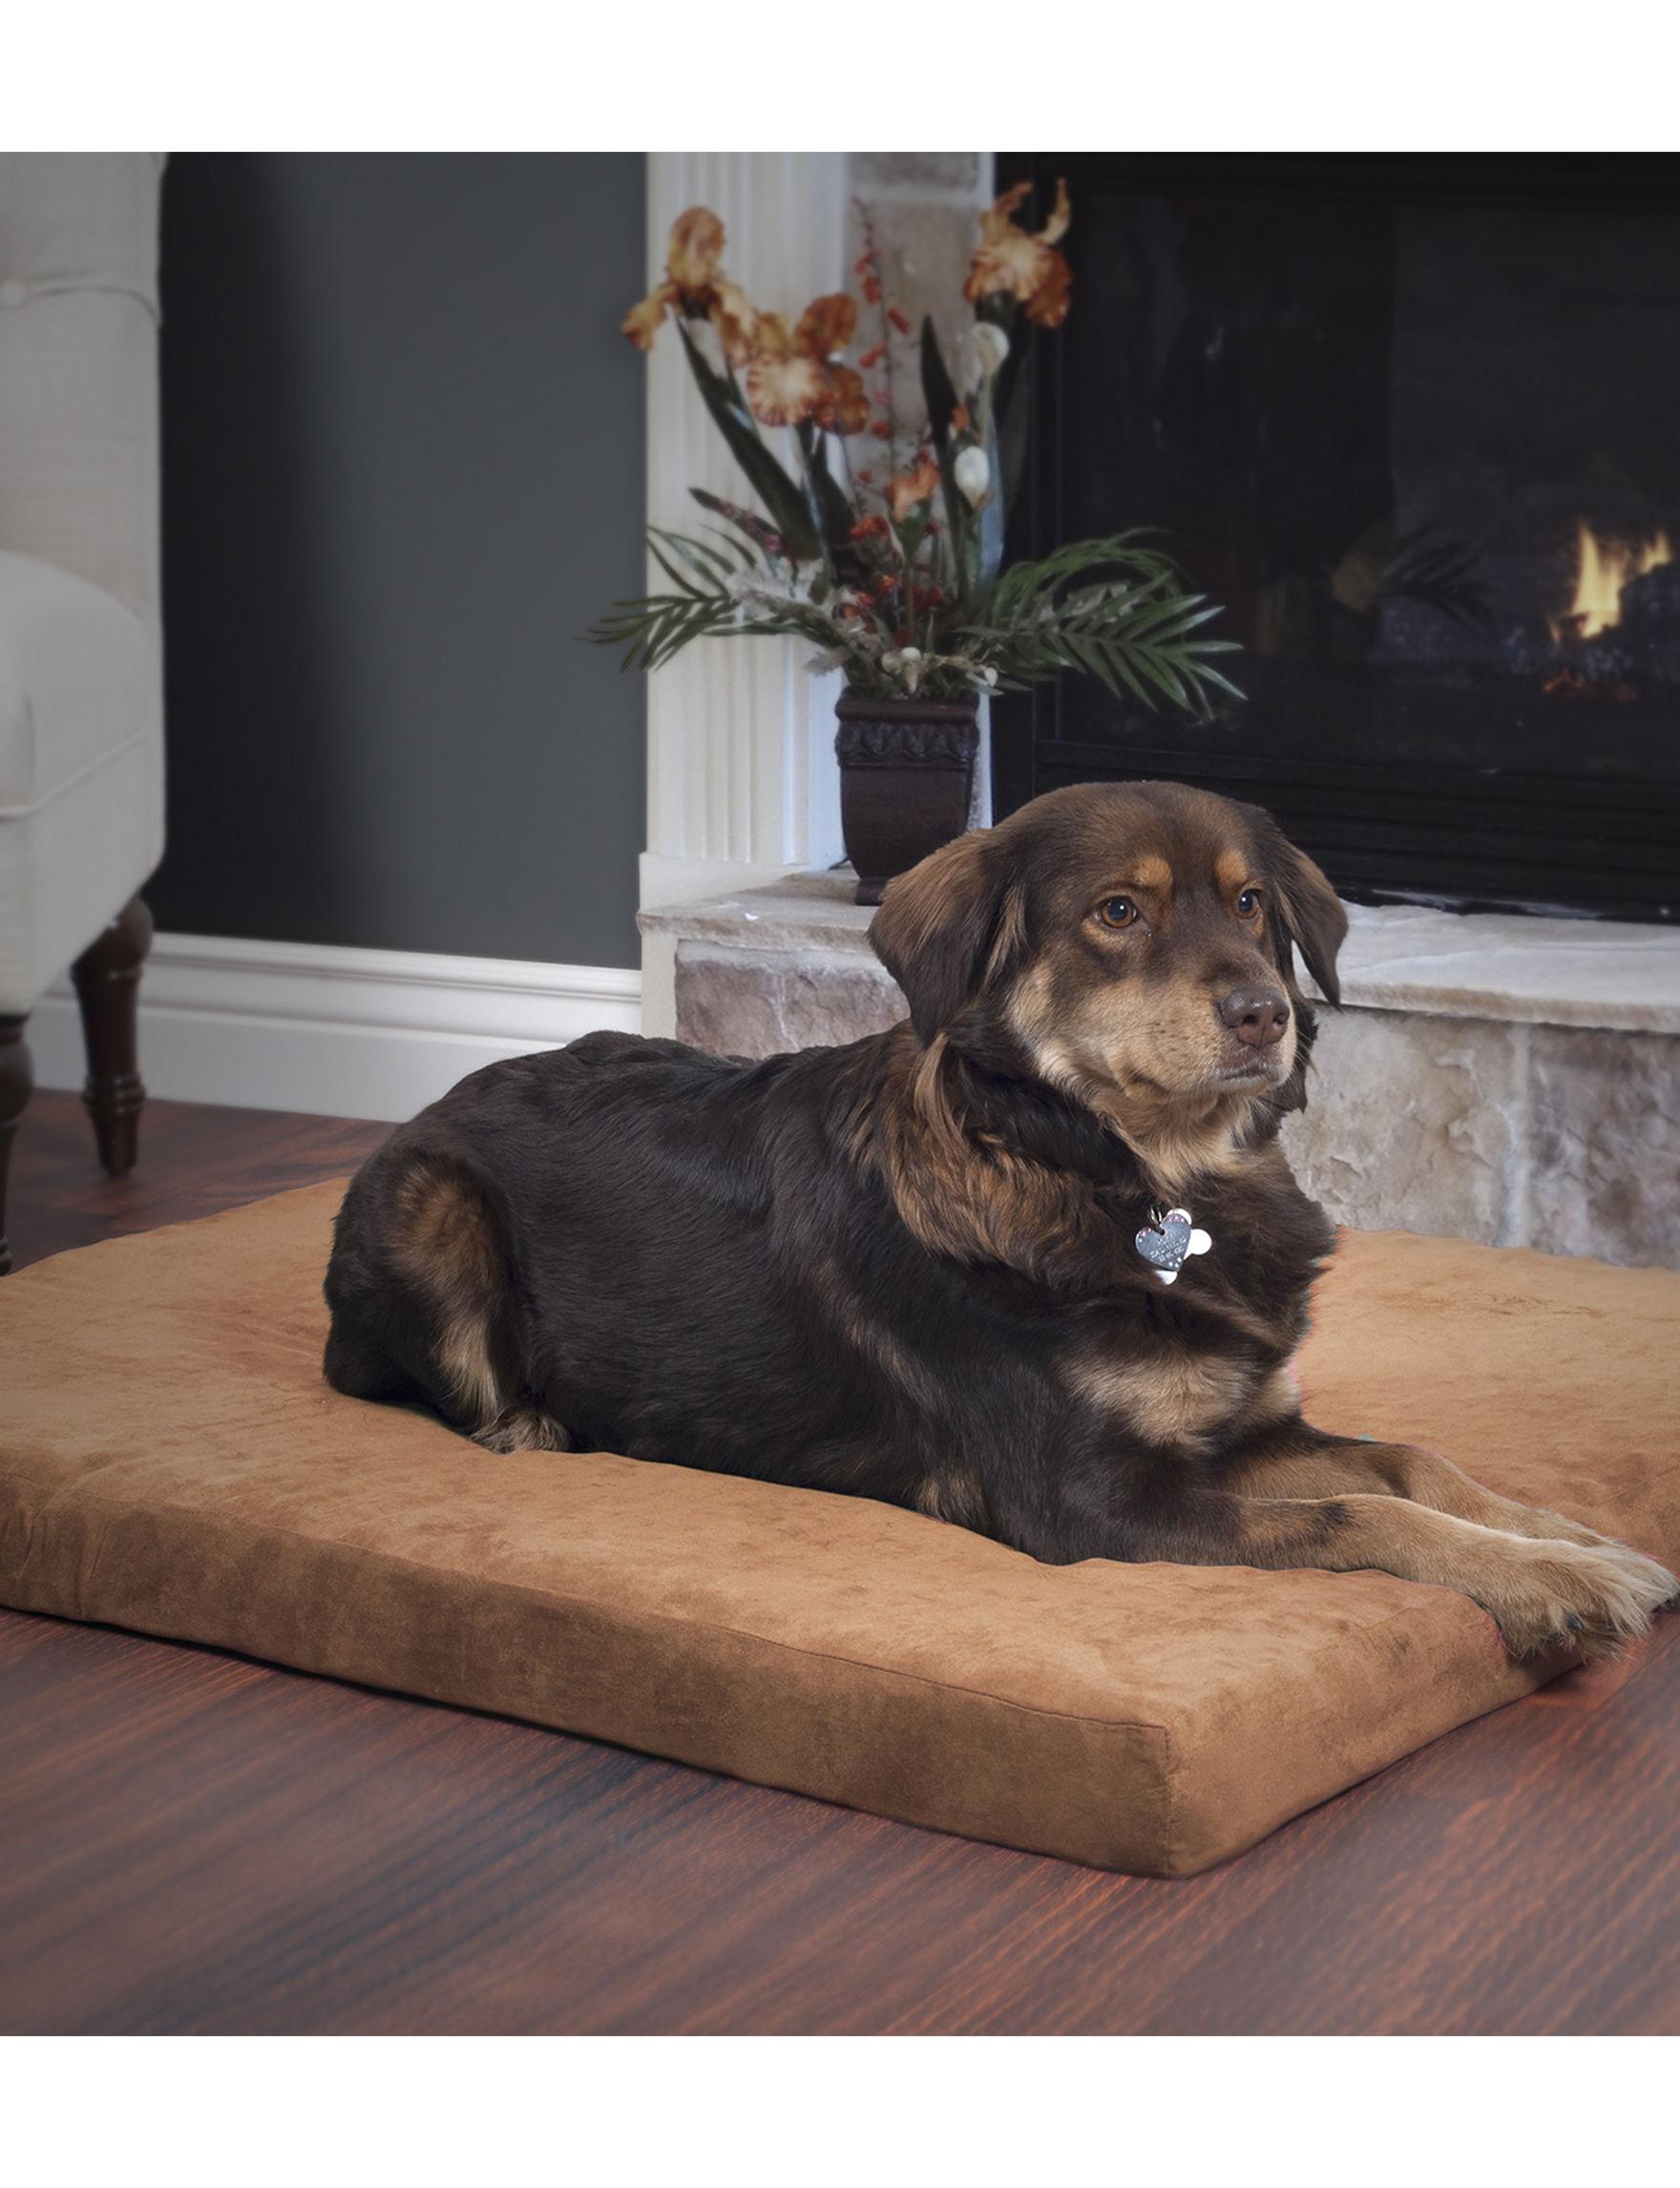 Petmaker Clay Pet Beds & Houses